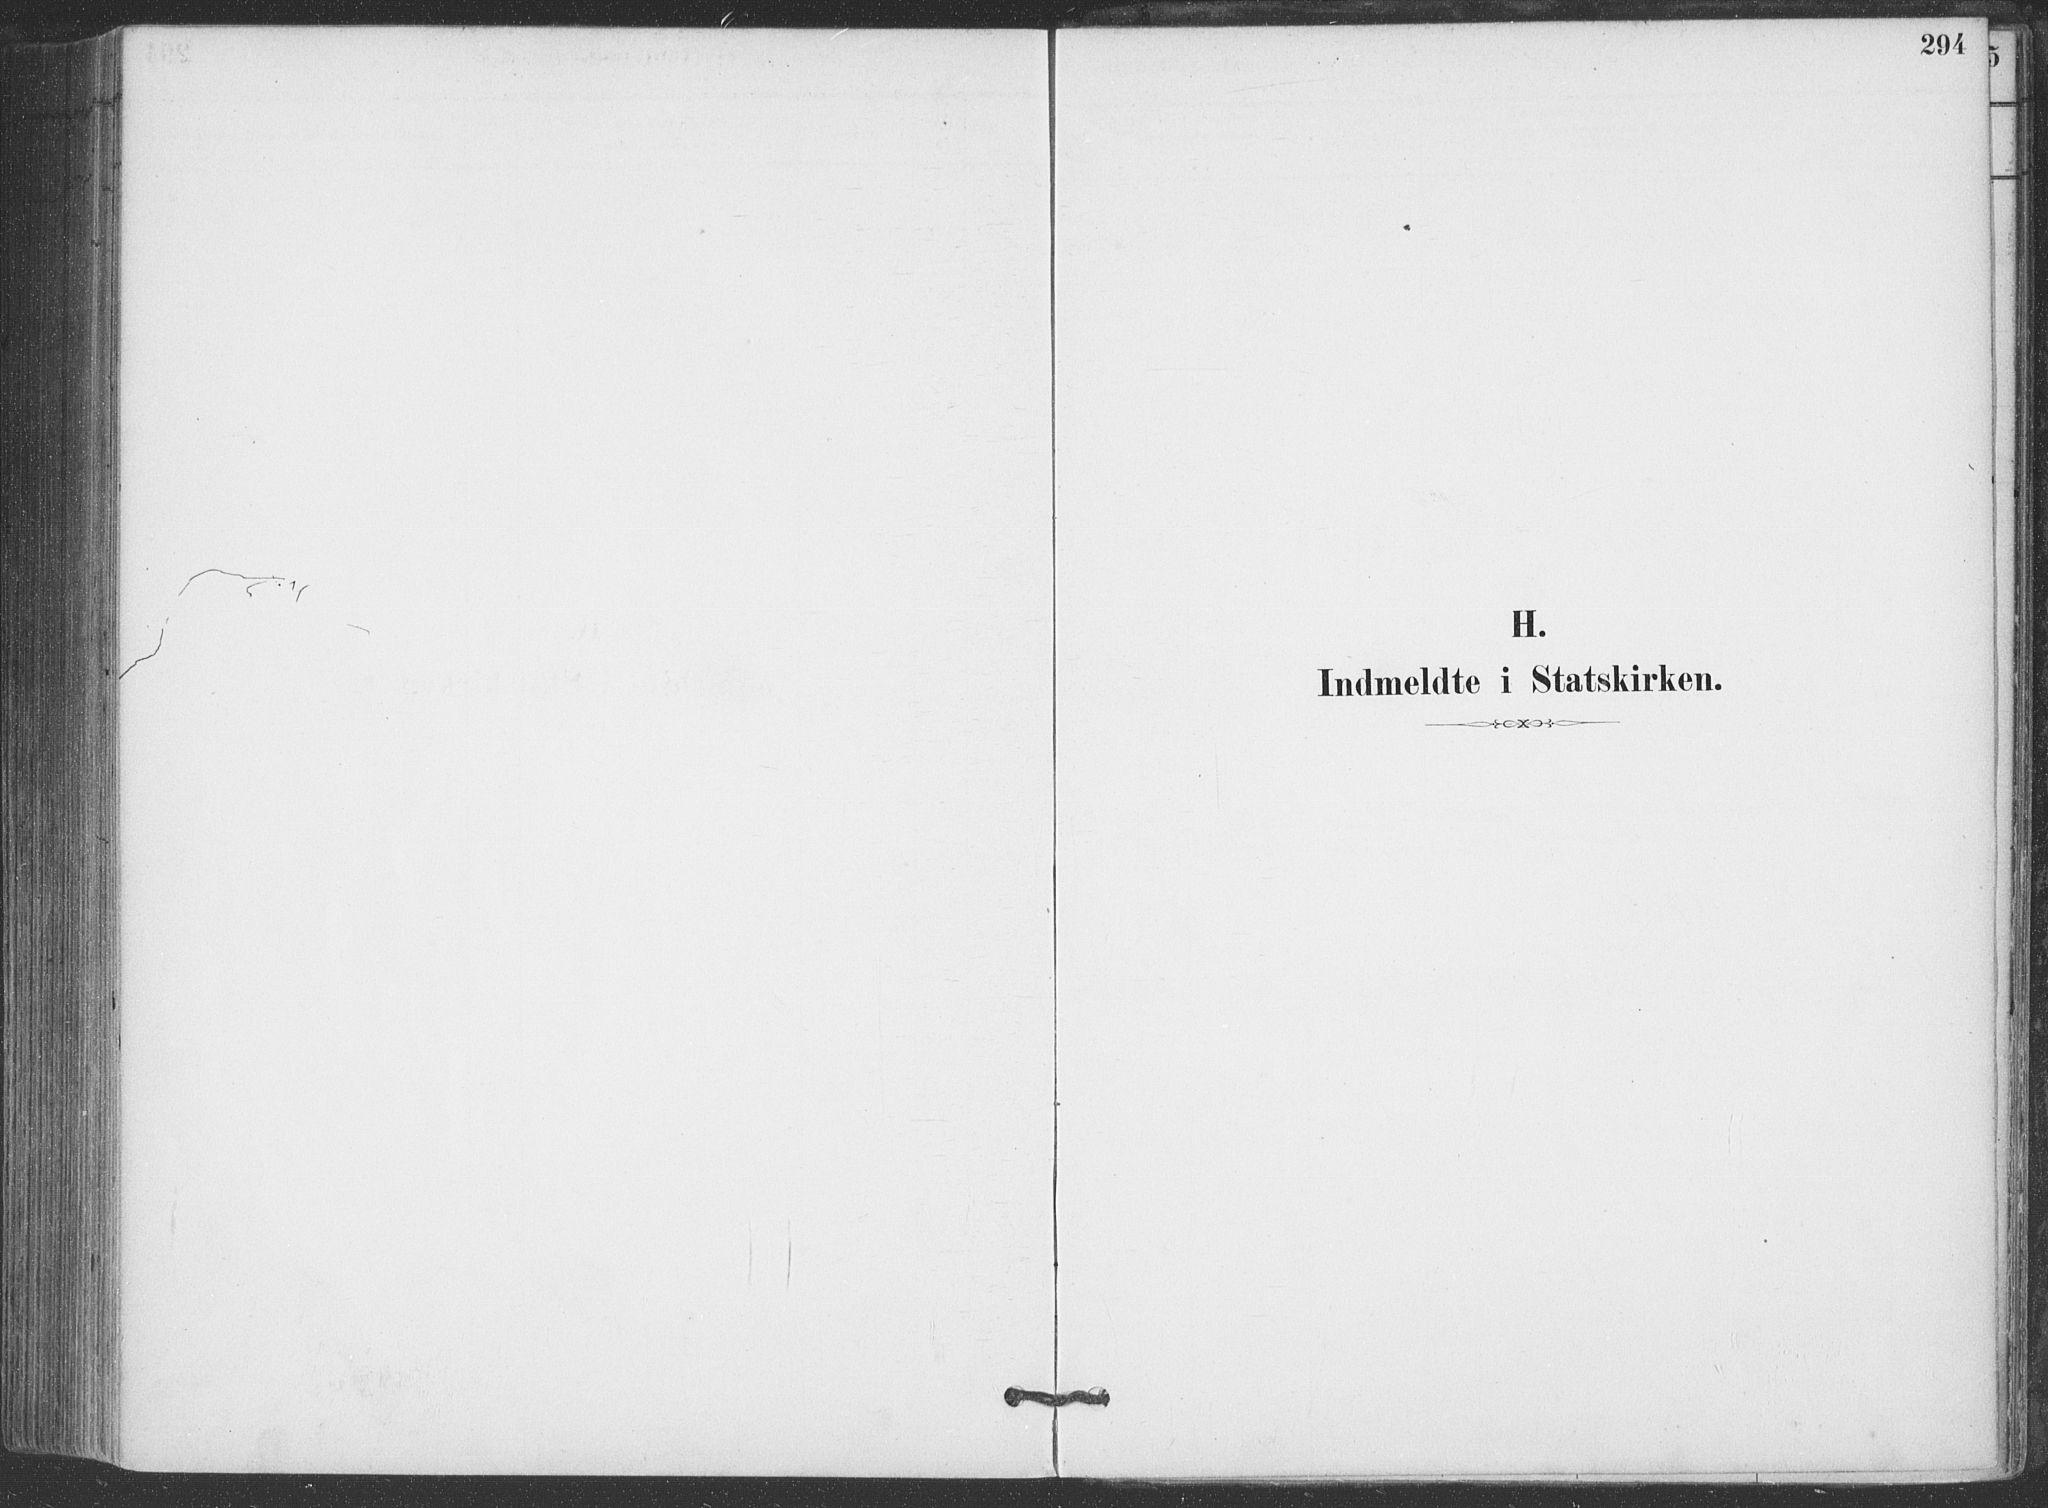 SAKO, Hjartdal kirkebøker, F/Fa/L0010: Ministerialbok nr. I 10, 1880-1929, s. 294